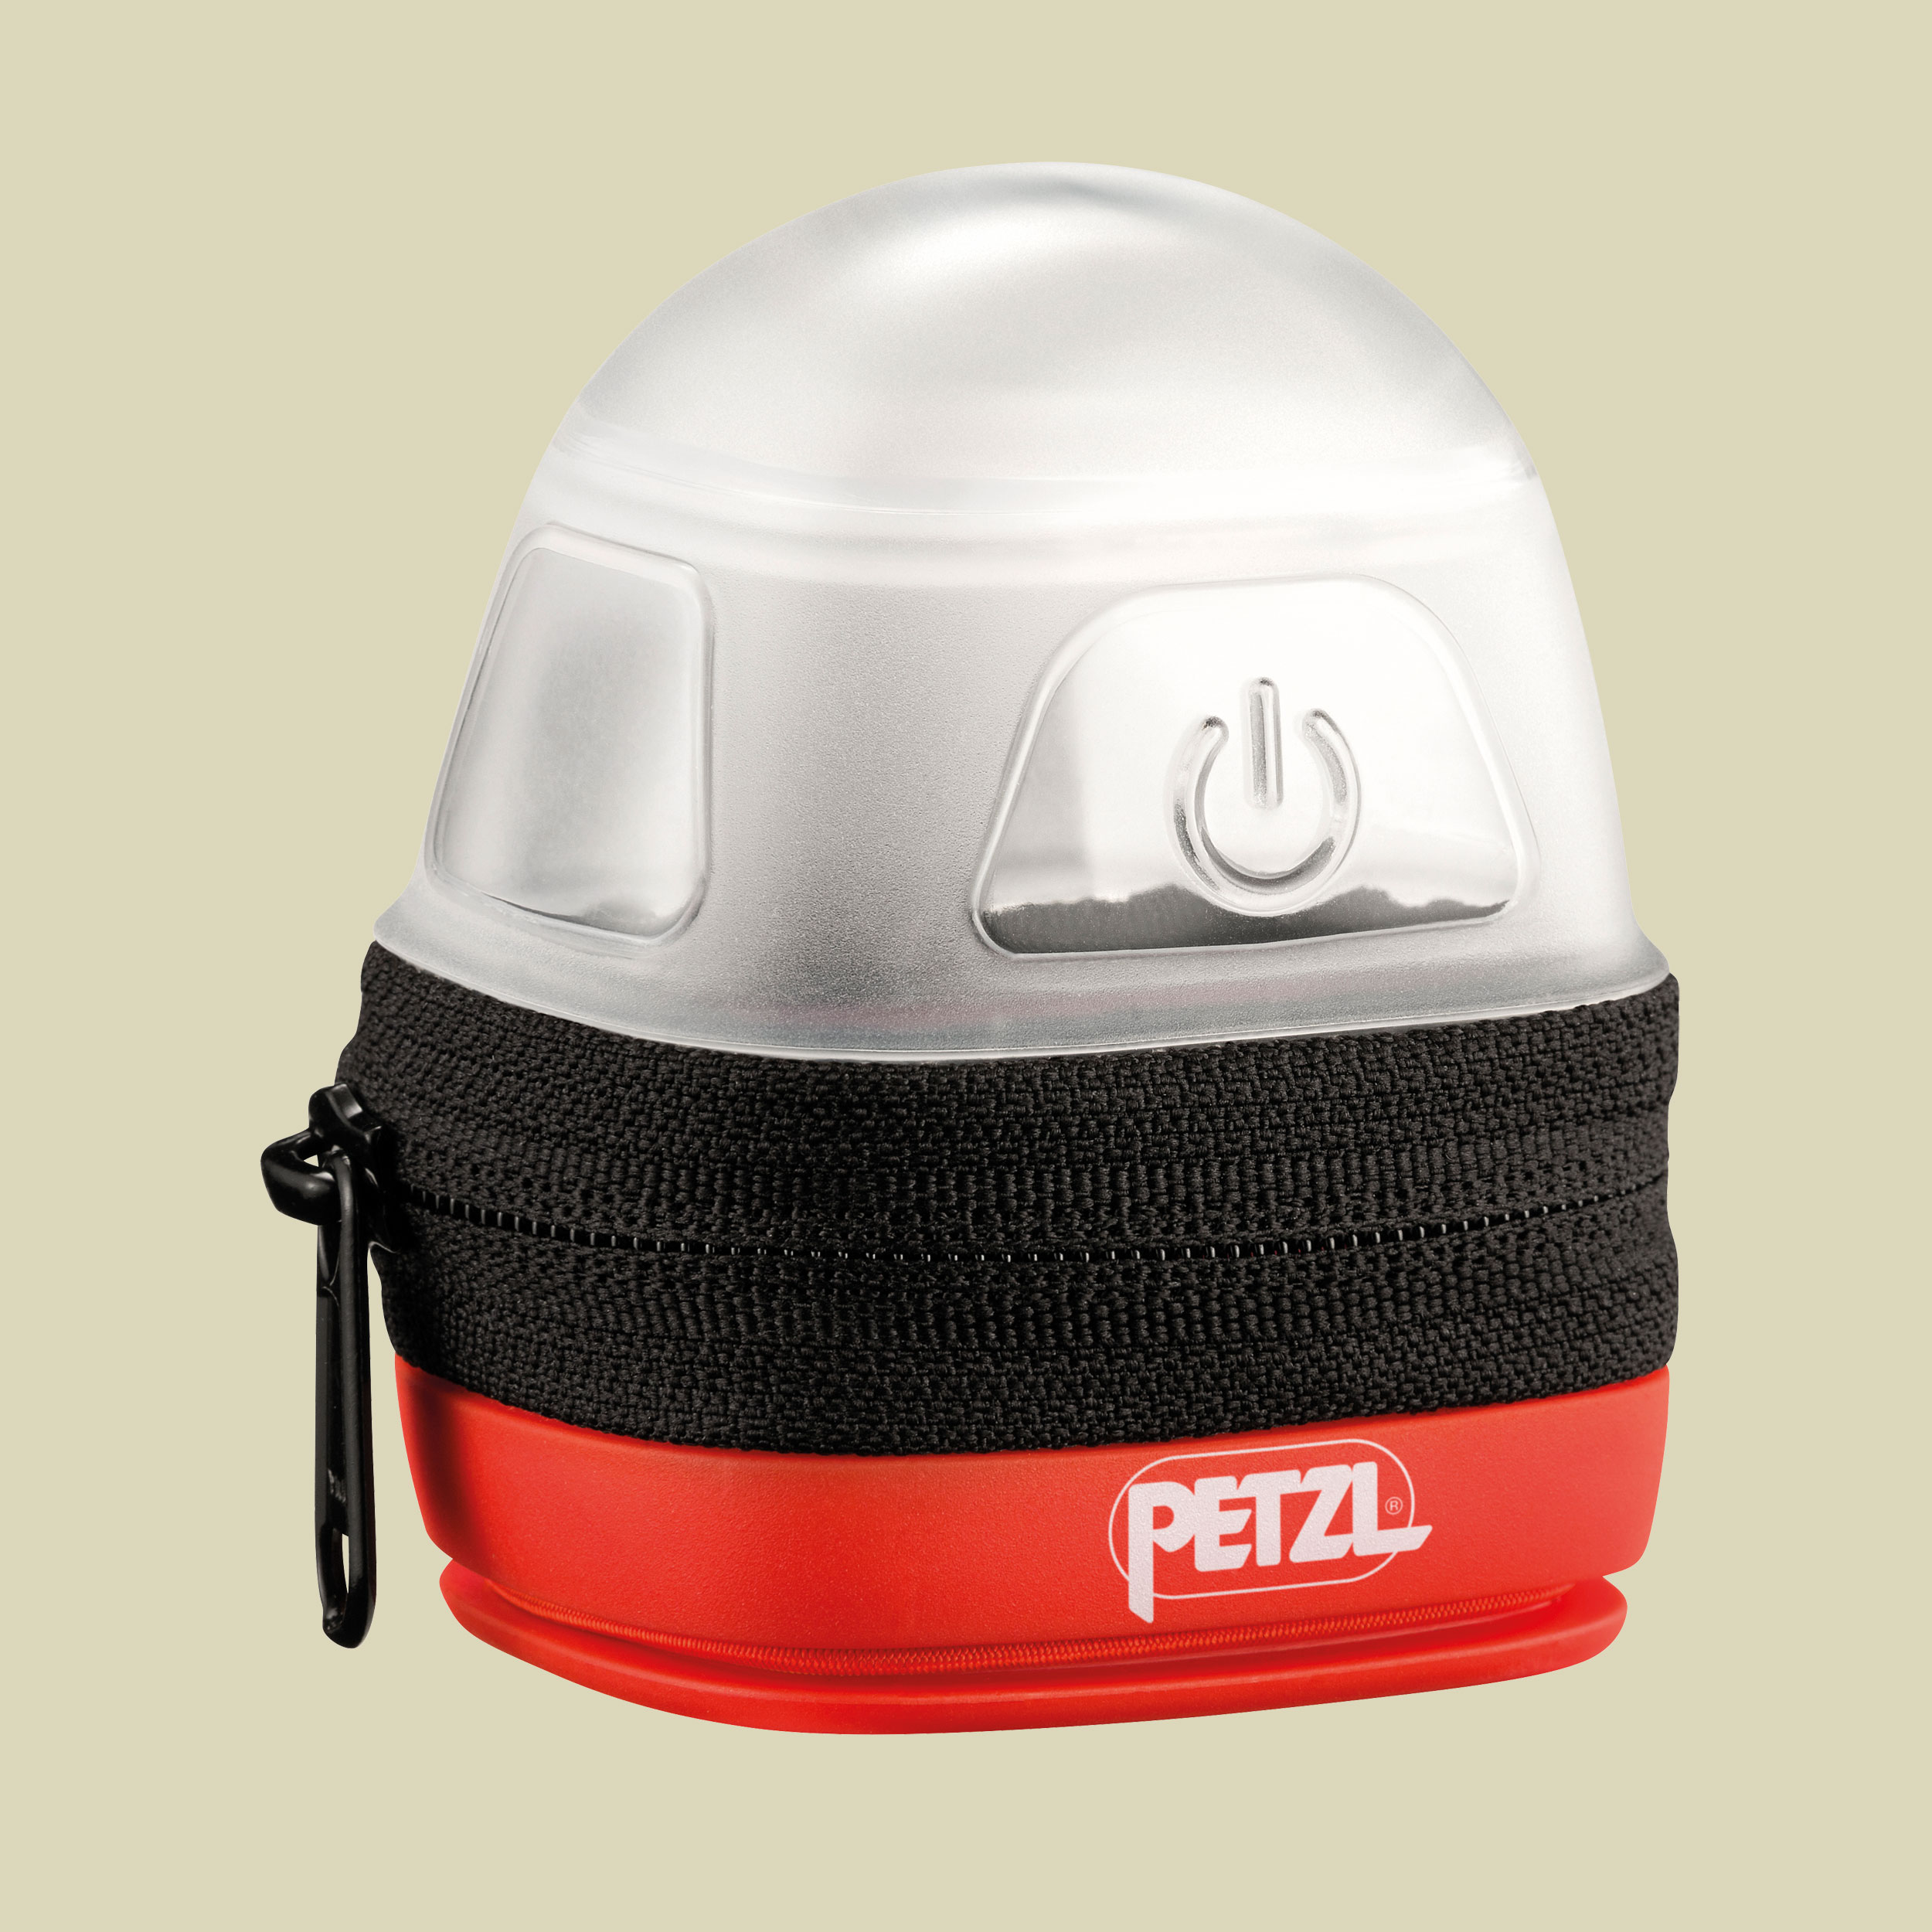 Petzl Noctilight Etui für Stirnlampe